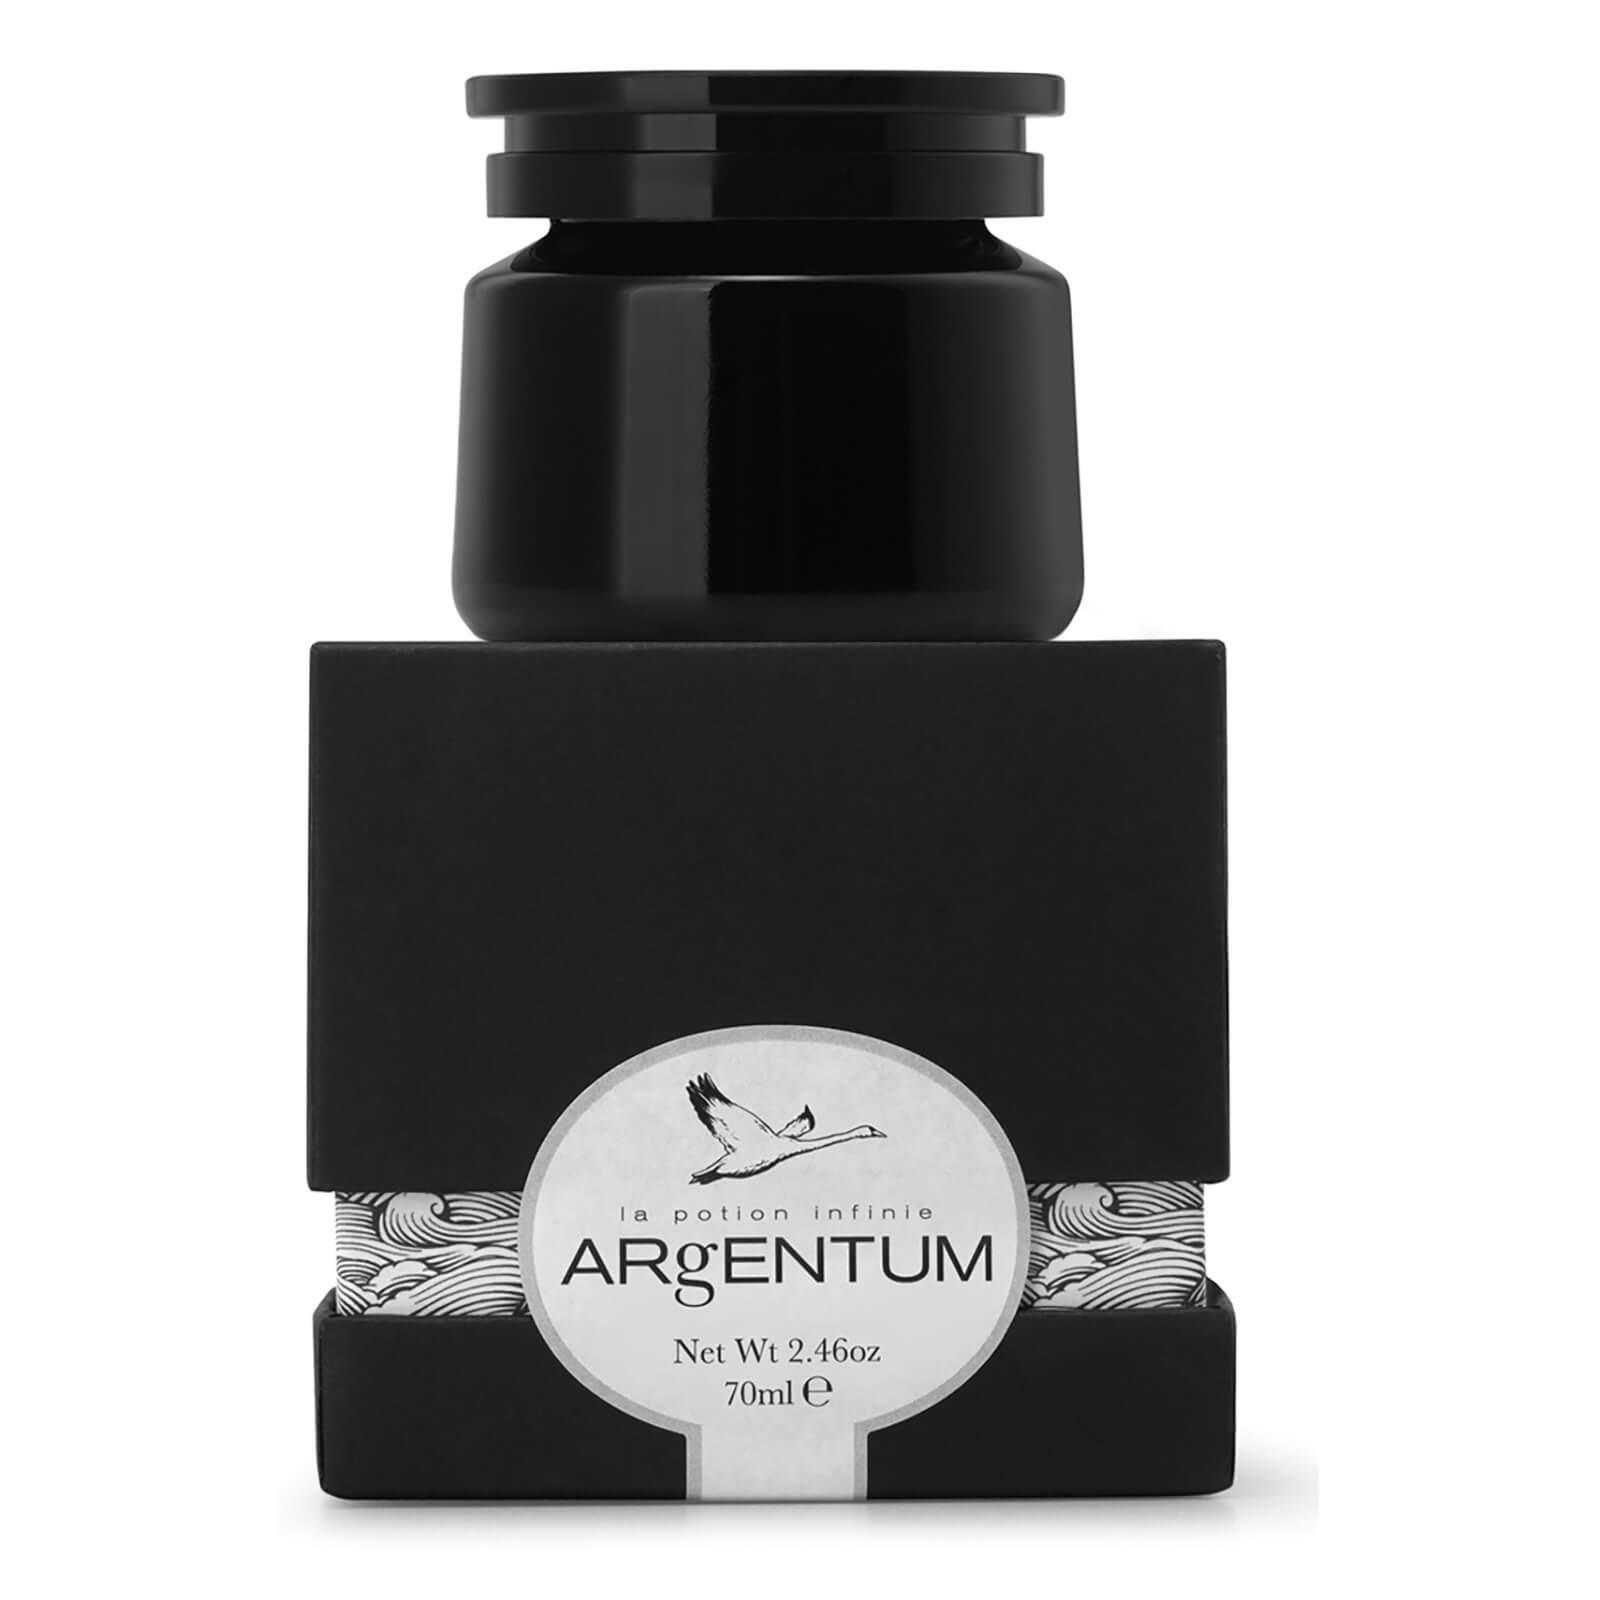 ARgENTUM La potion infinie 银霜 70ml 周末6折